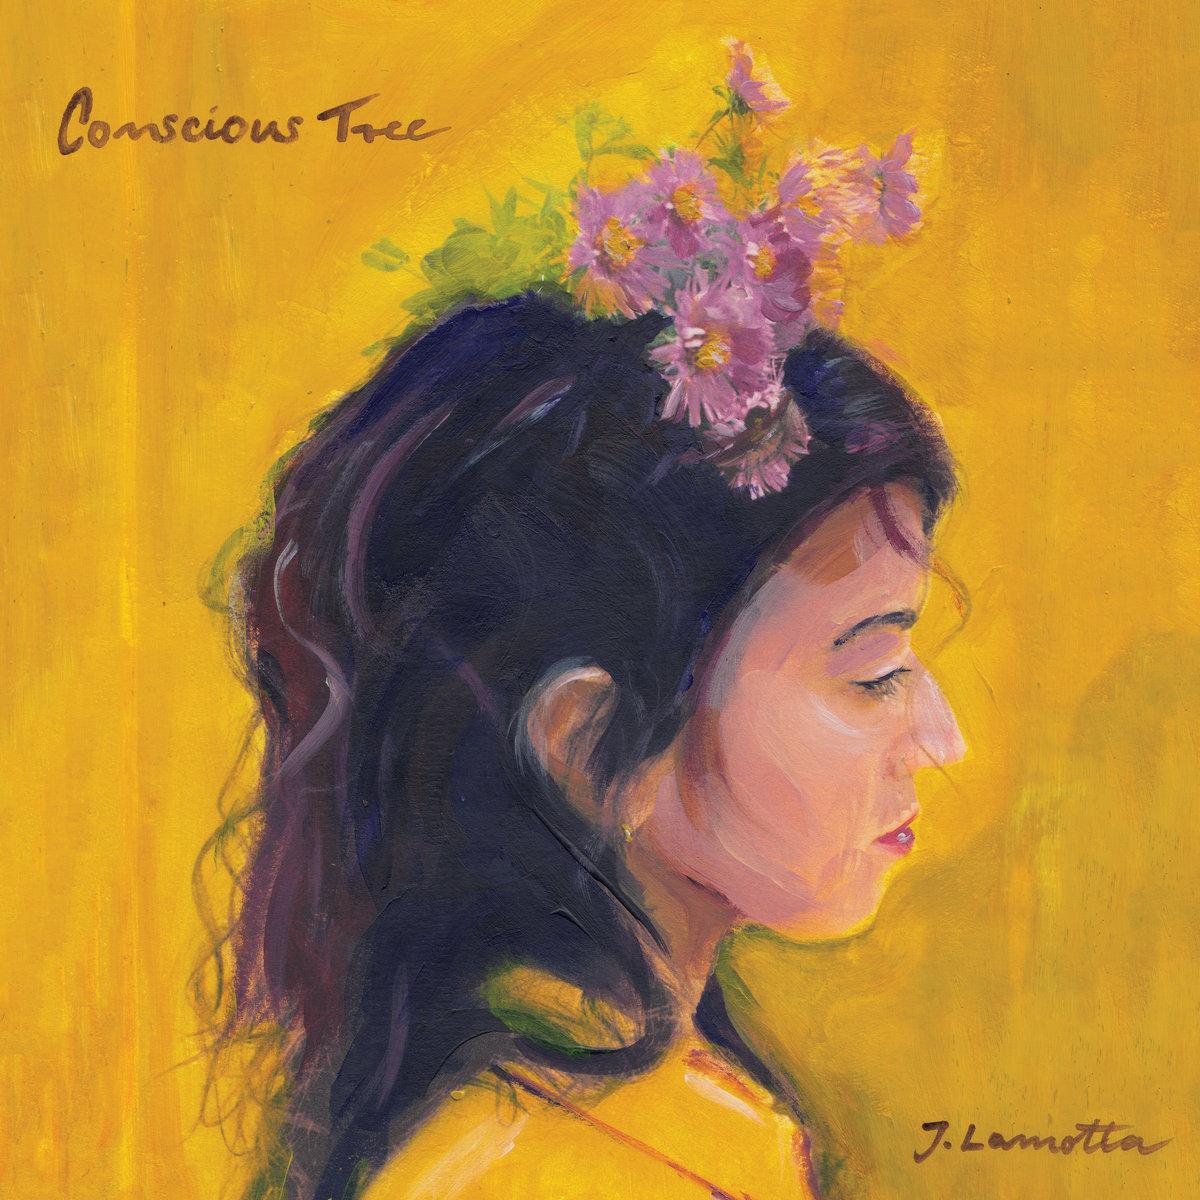 Jakarta Dubplate #12 - Conscious Tree | Jakarta Records